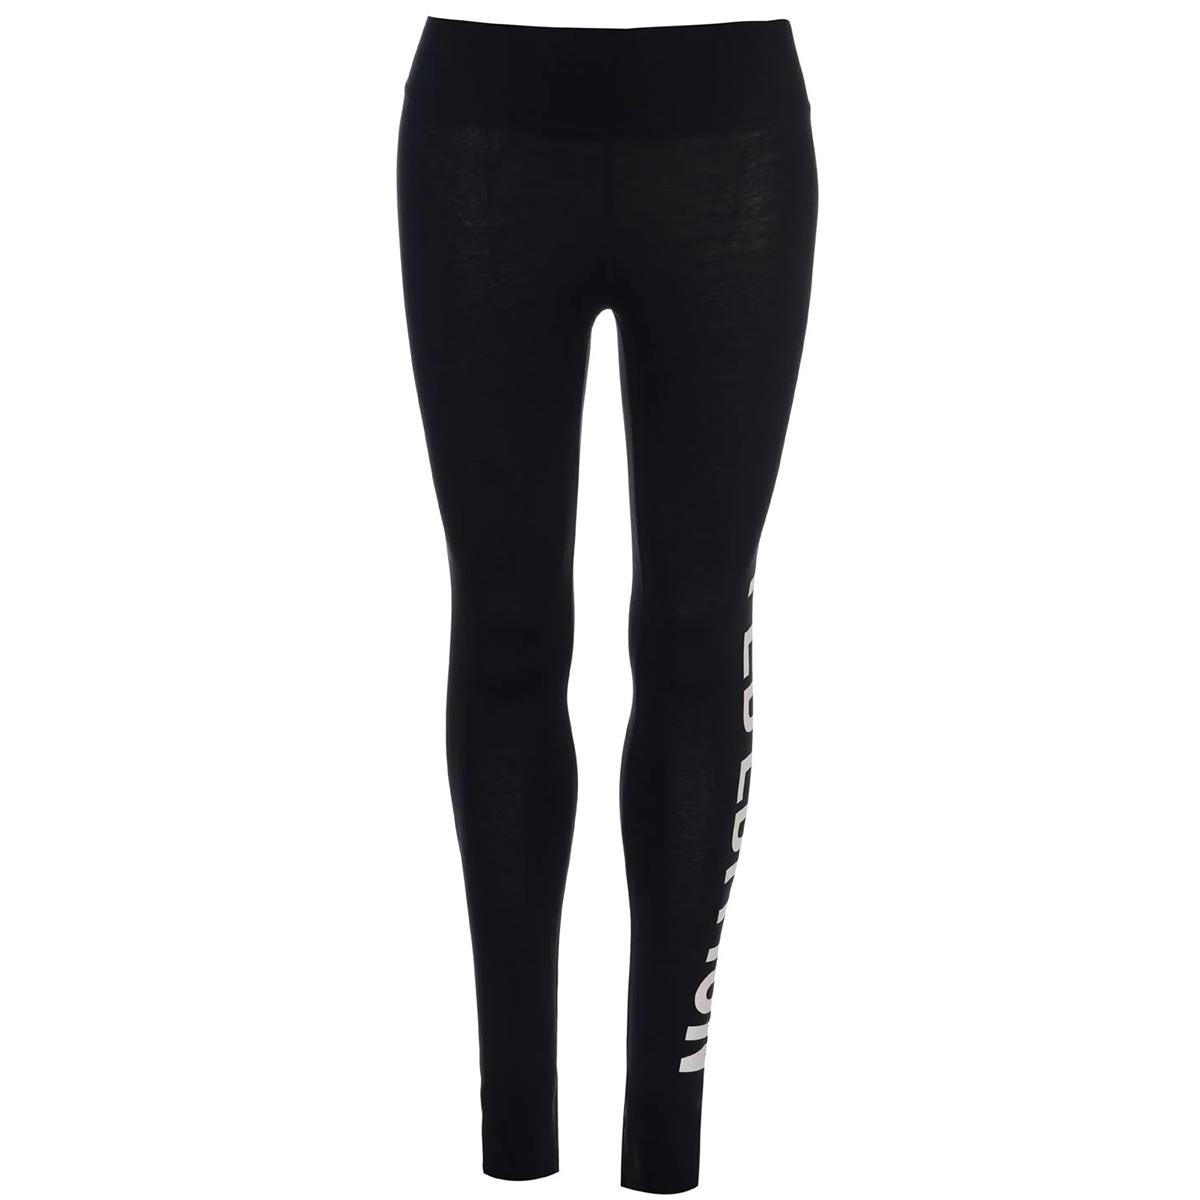 Golddigga Women's Long Length Leggings - Black, 2